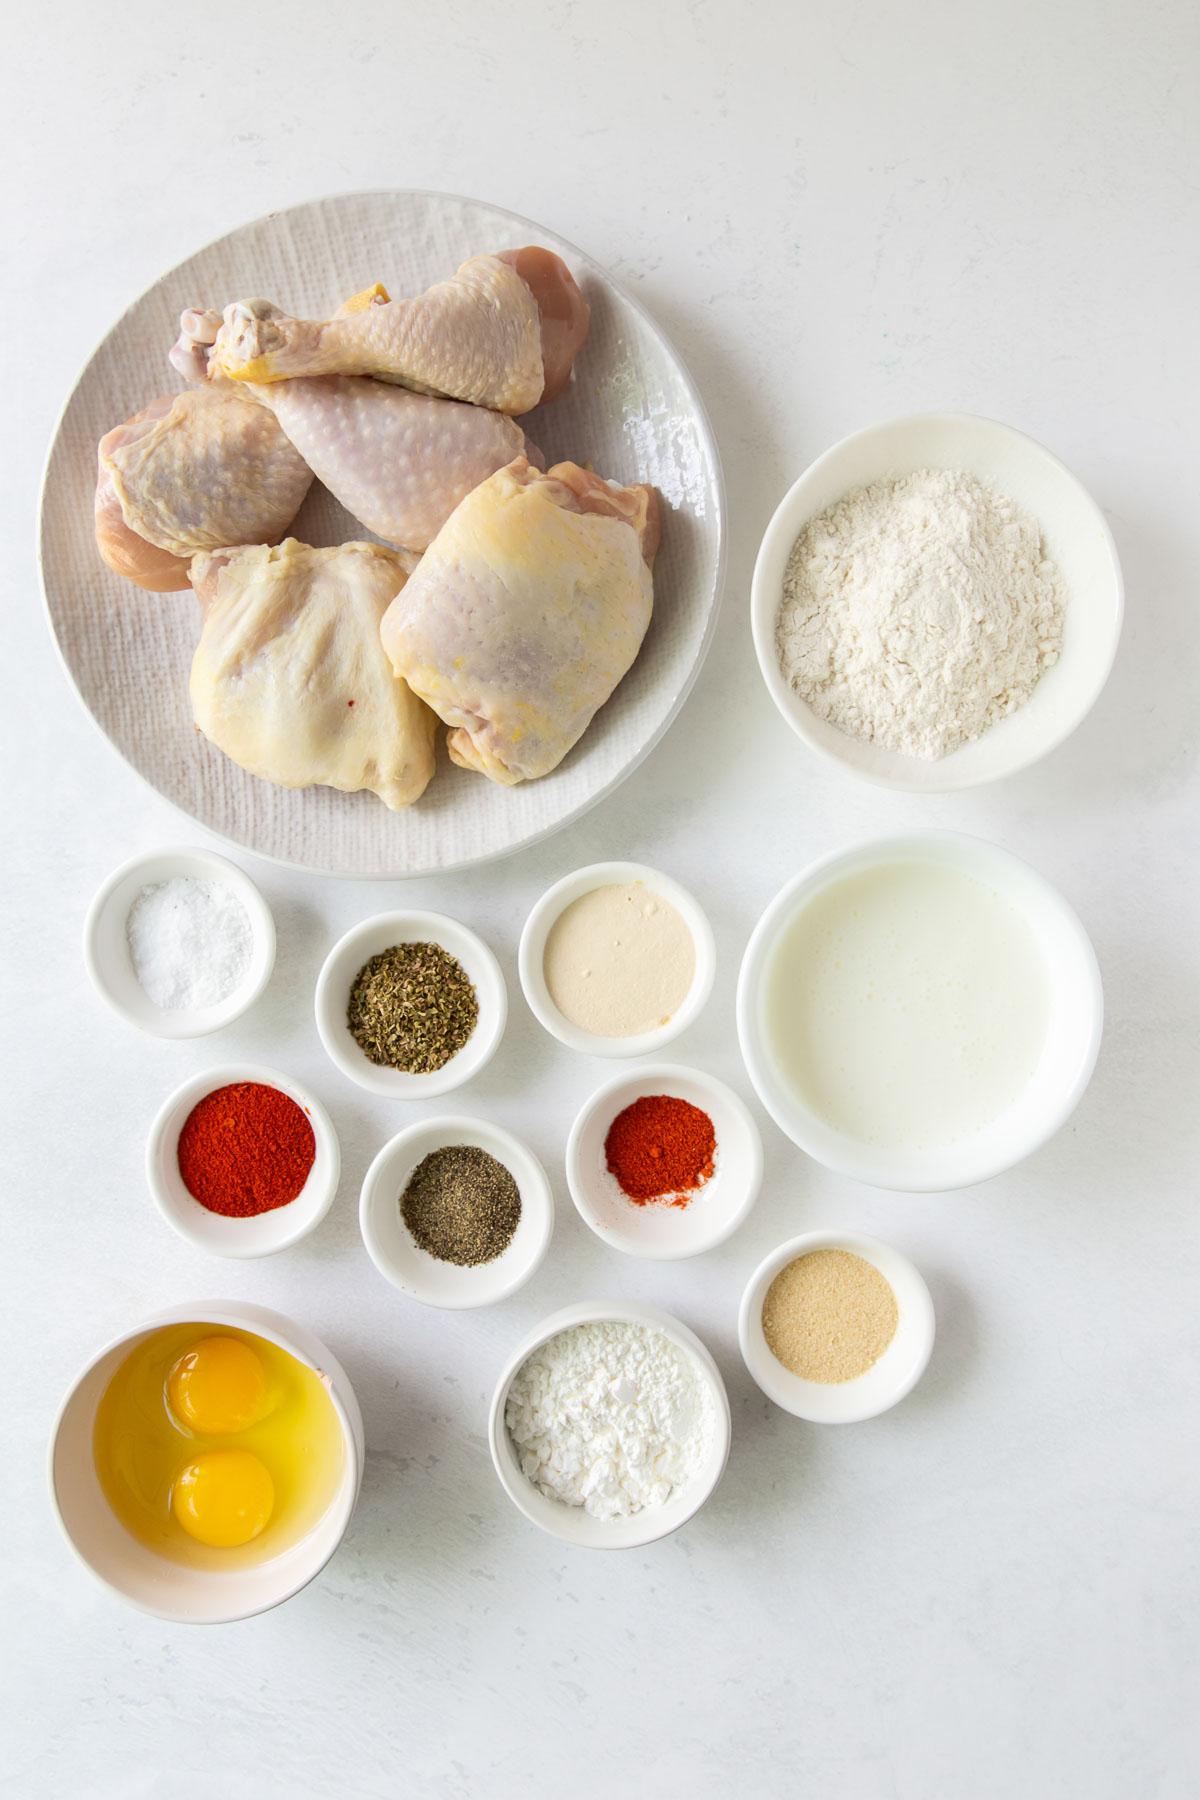 ingredients for air fryer fried chicken recipe